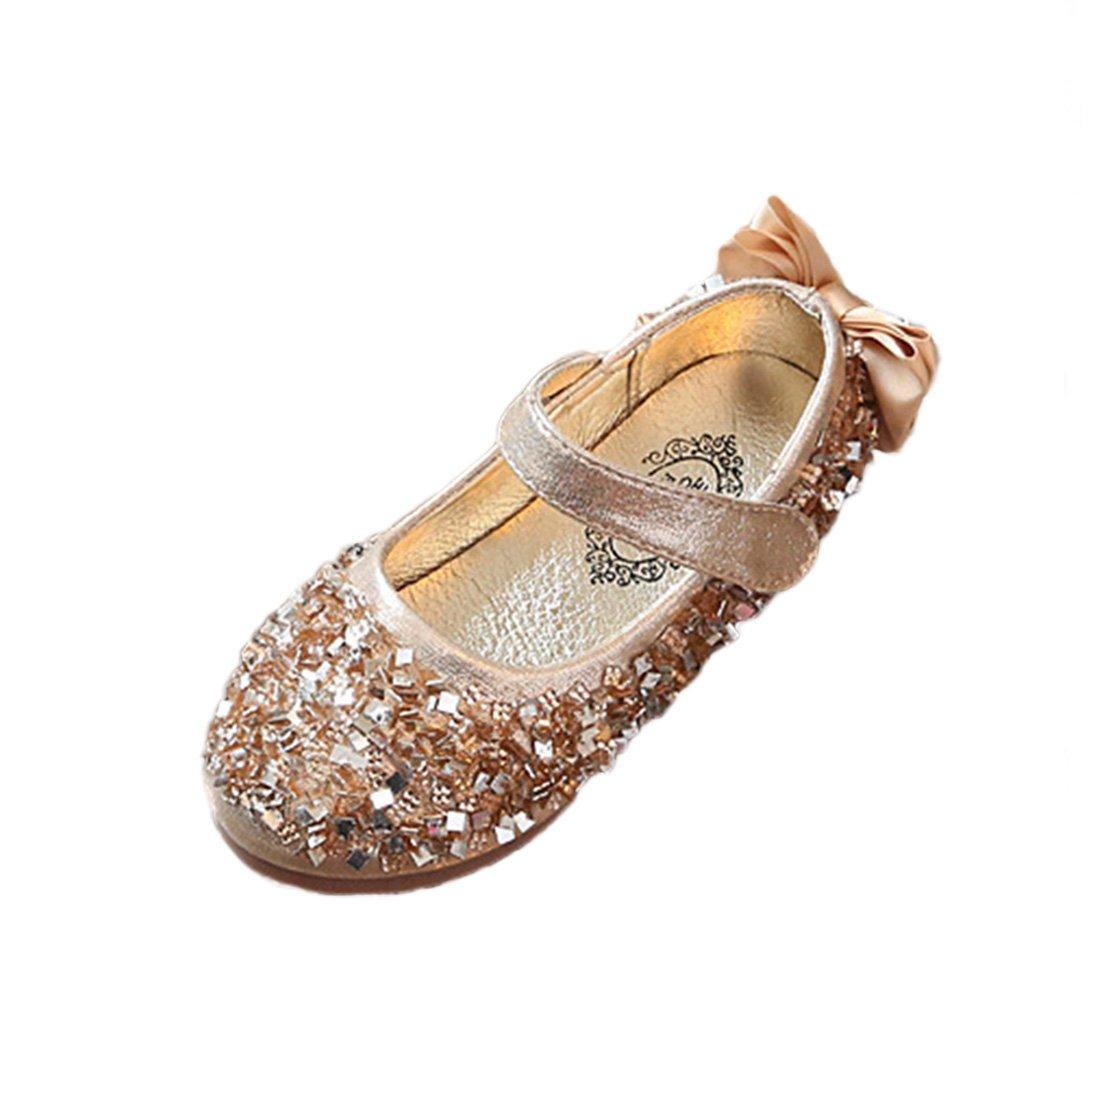 YIBLBOX Kids Girls Toddler Ballet Flats Shoes Mary Janes Wedding Party Princess Dress